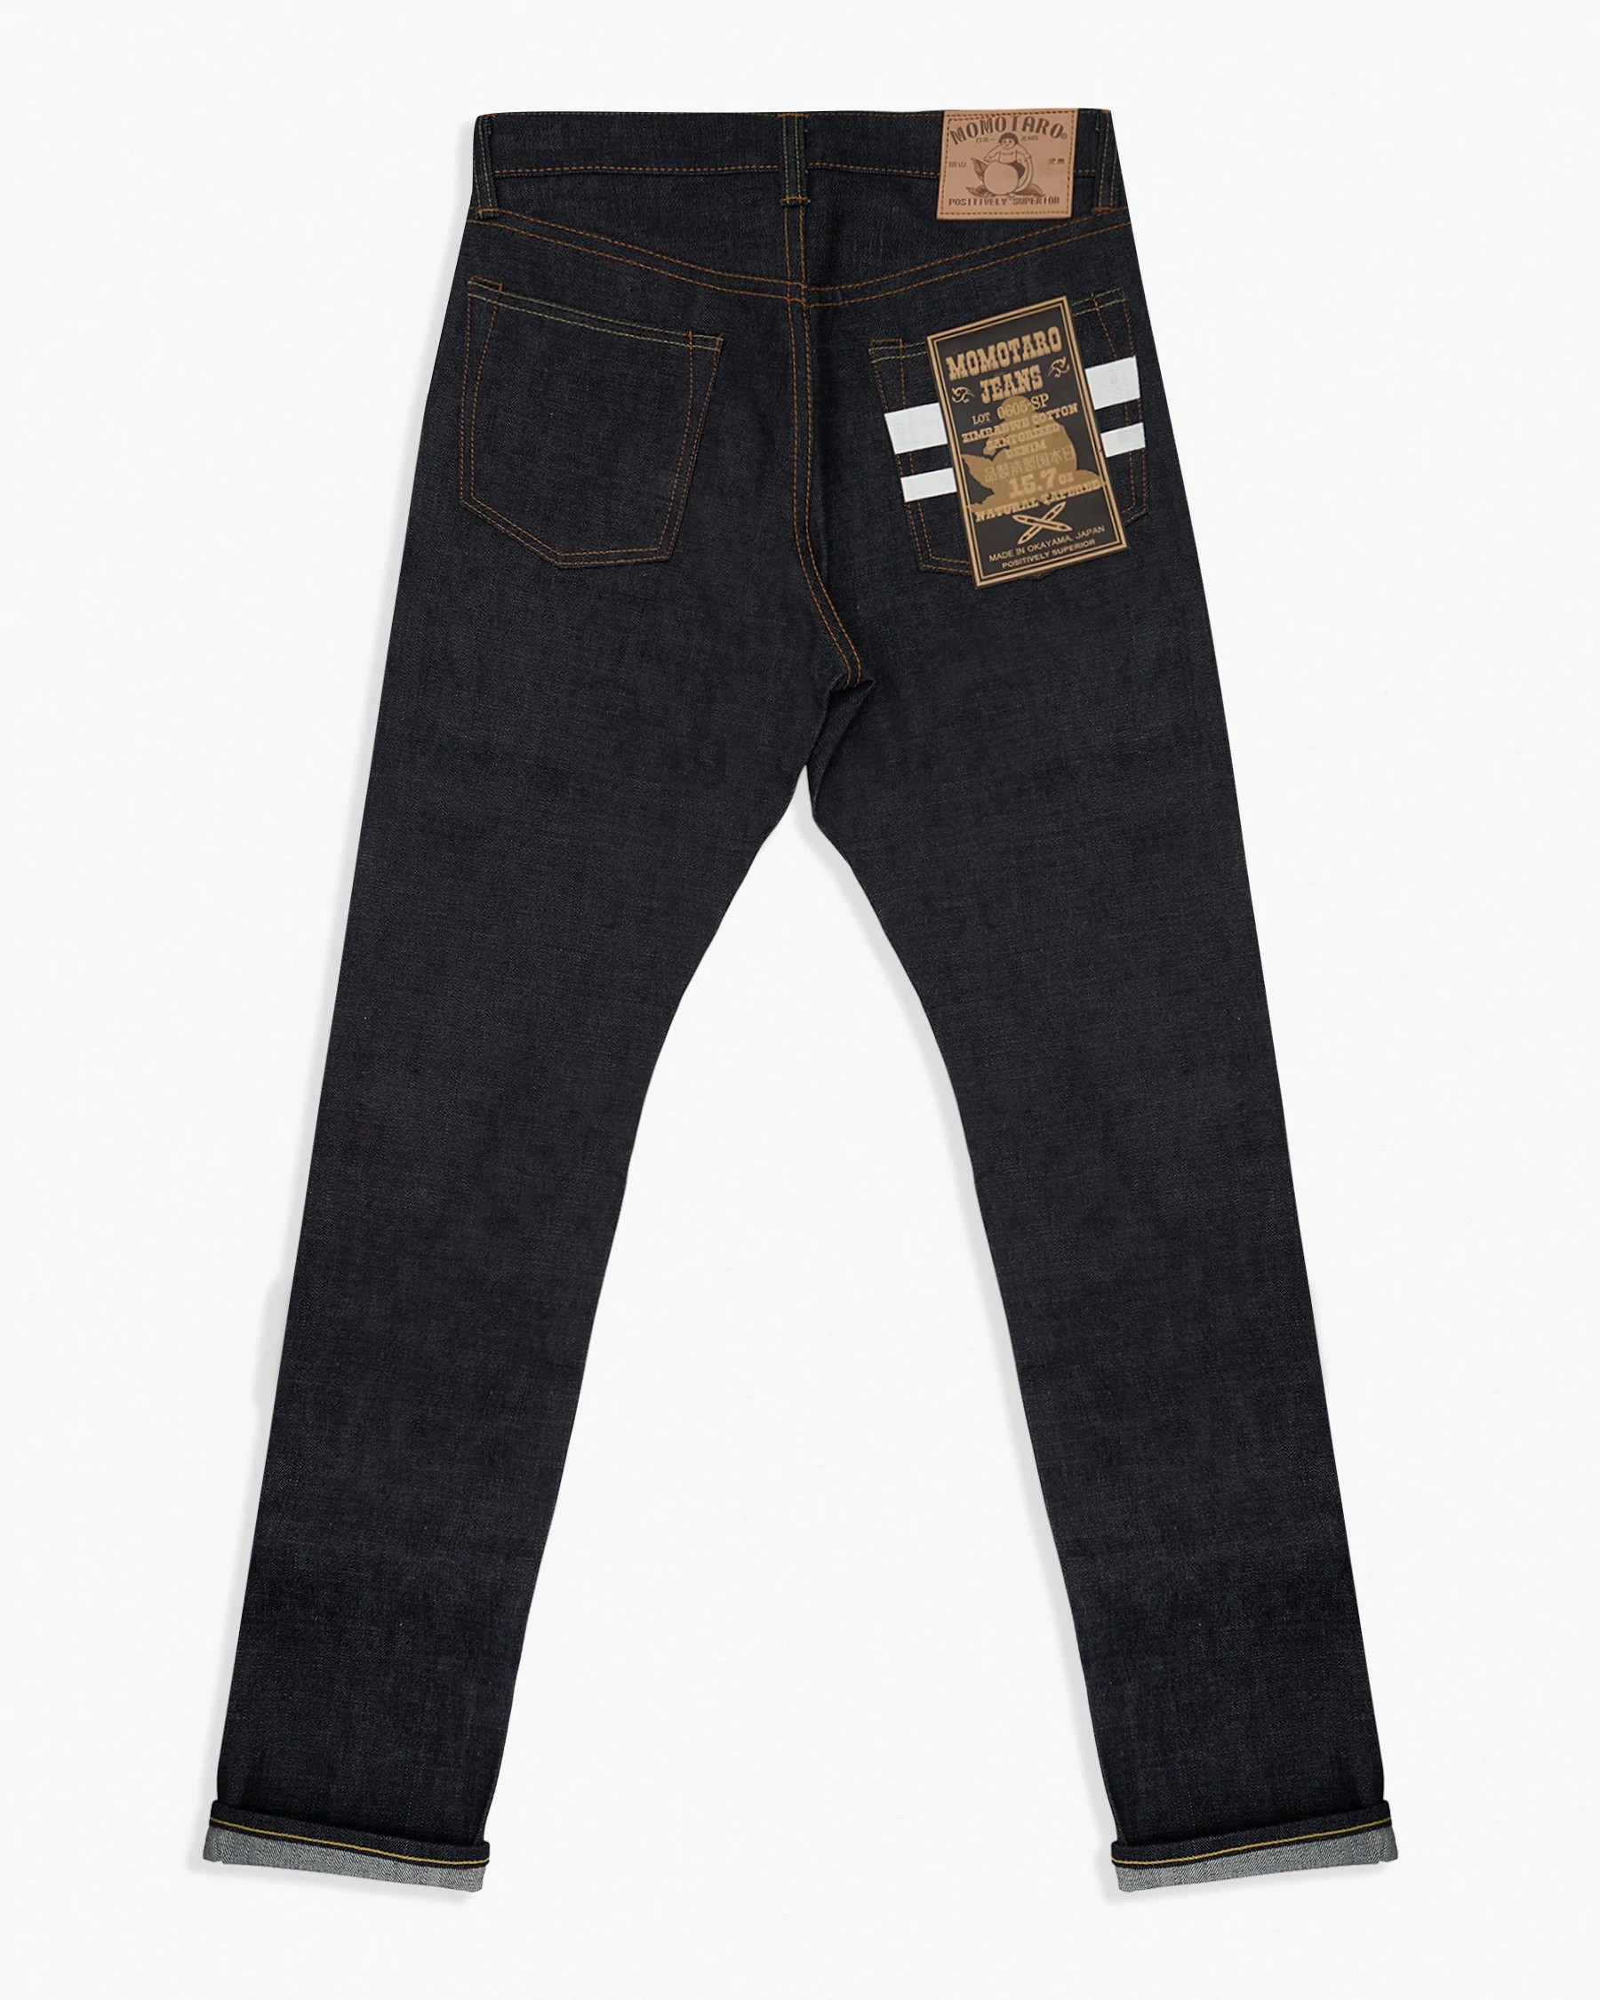 Blac 15.7oz Zimbabwe Cotton Selvedge Denim Momotaro Tight Tapered Mens Jeans